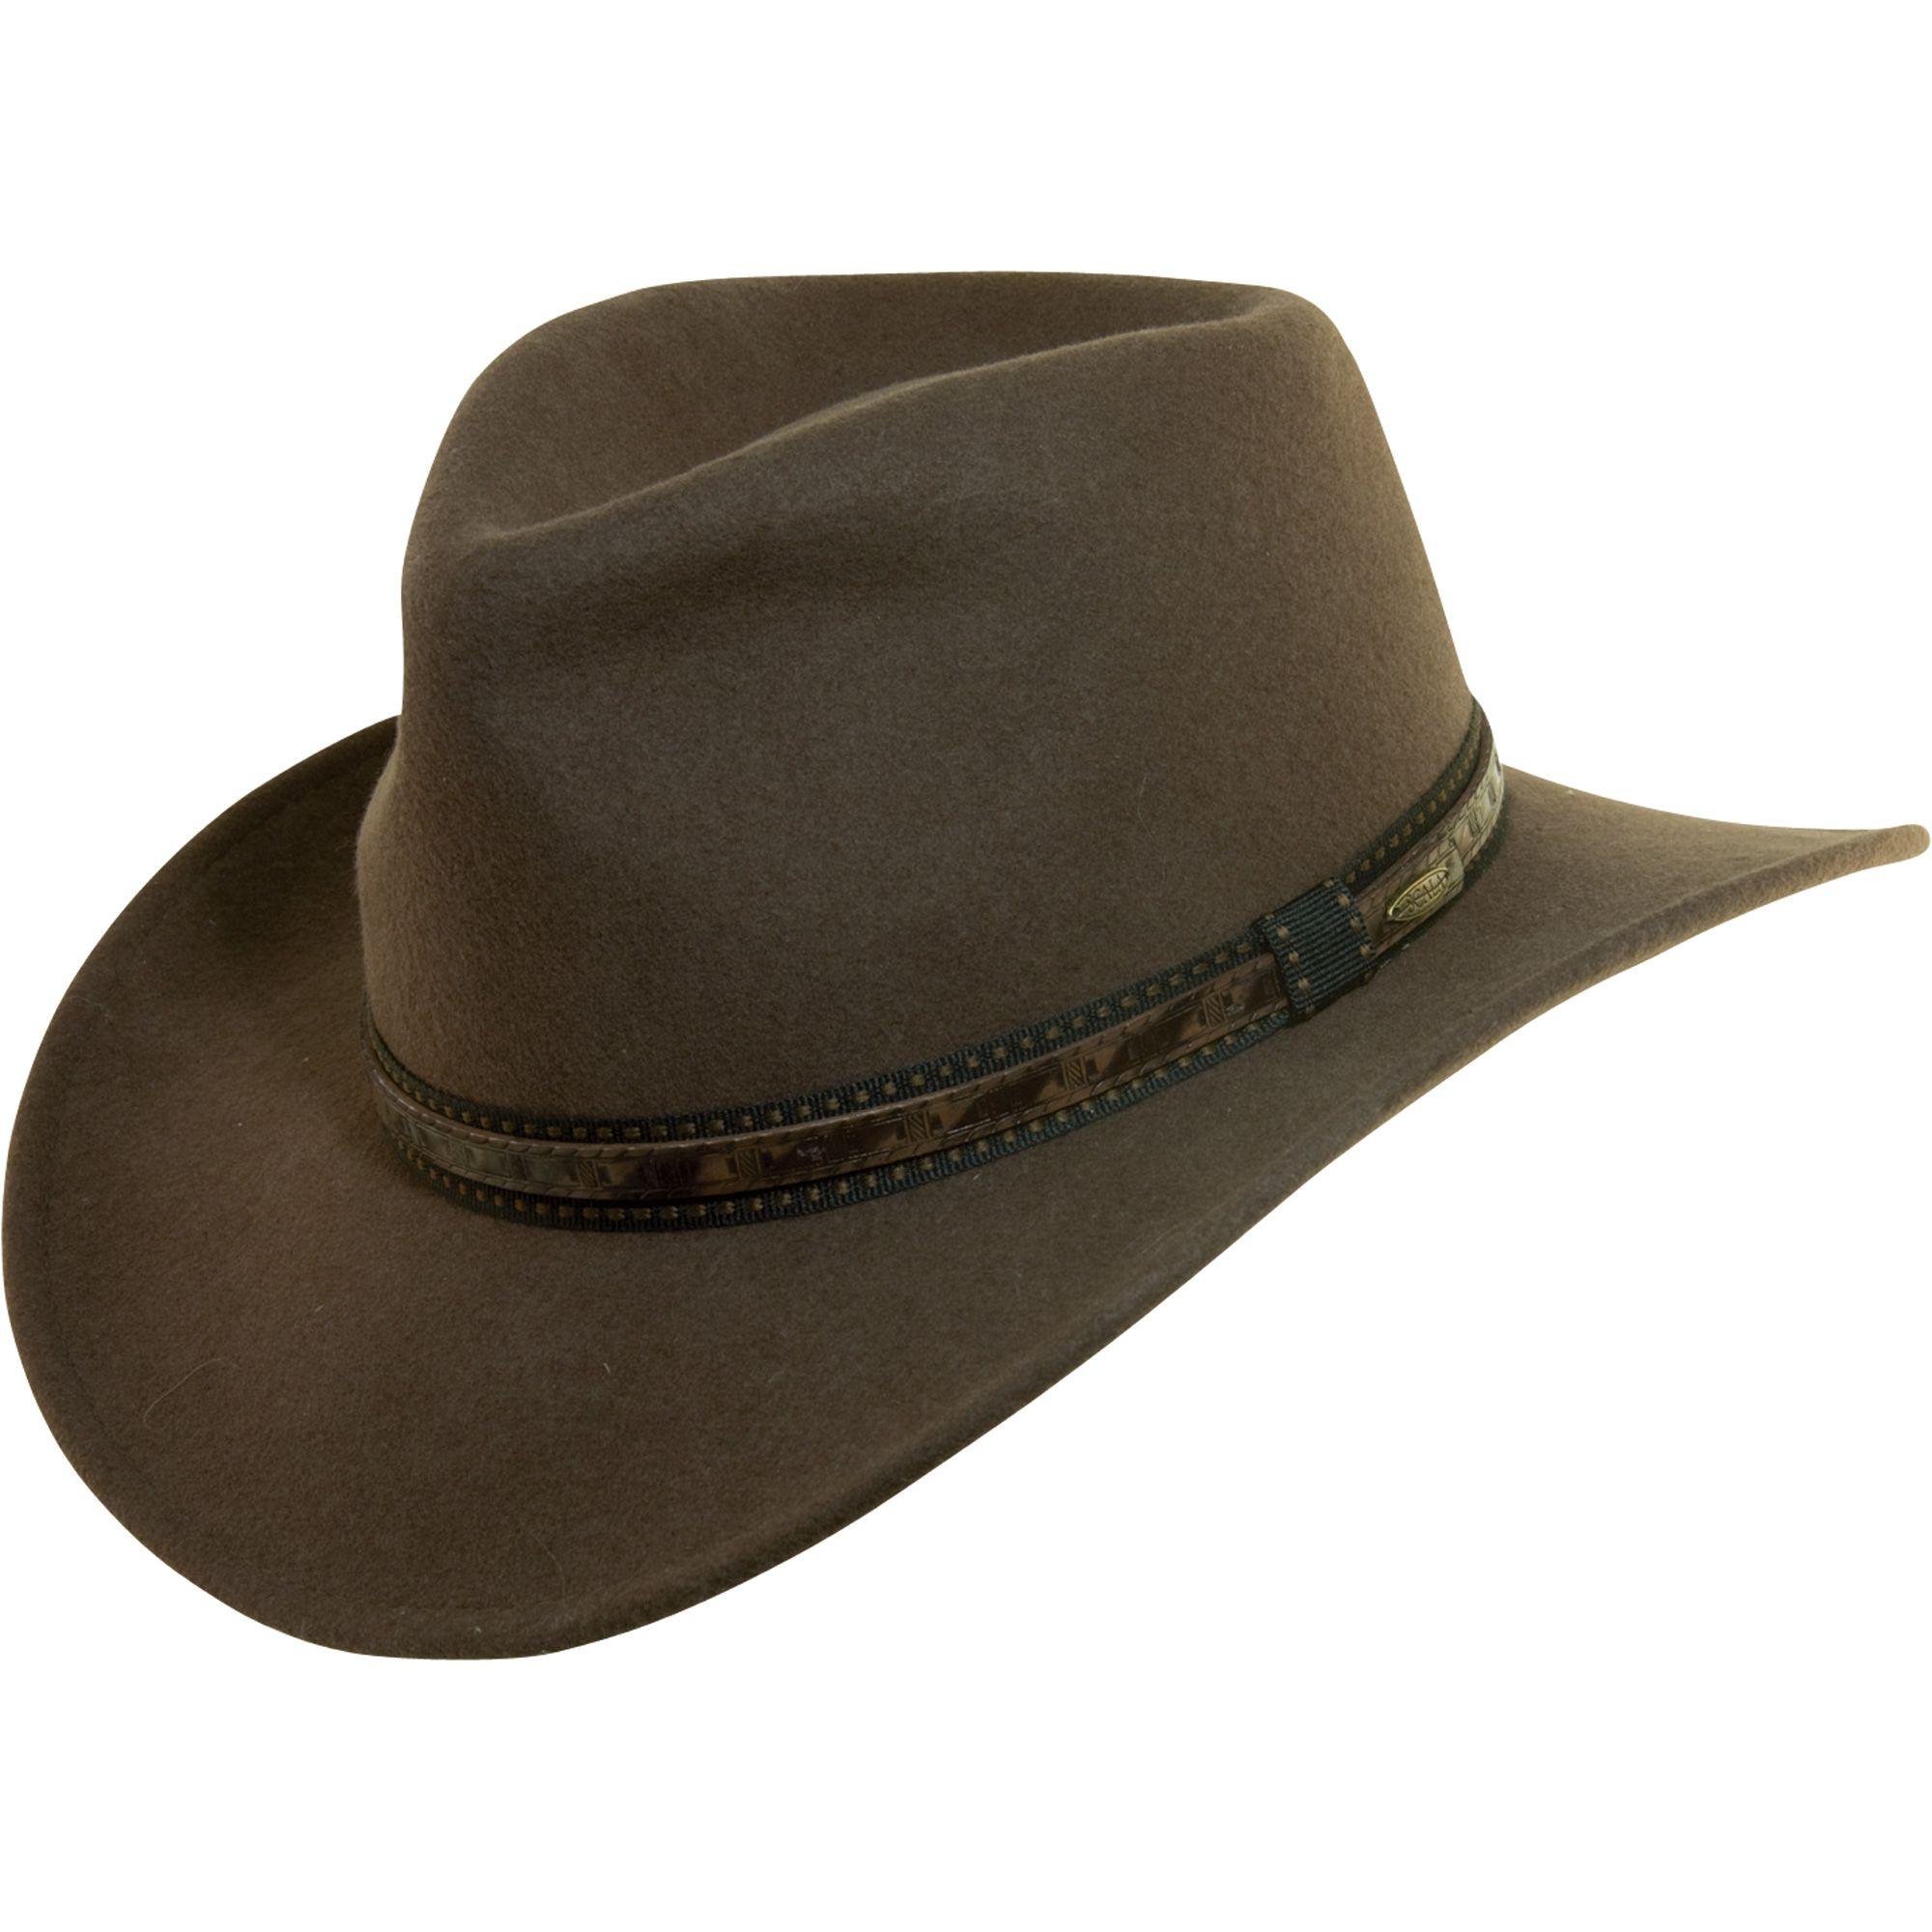 76c1c48240b89 Stunning Menu0027s Dorfman Pacific Wool Felt Outback outback hat